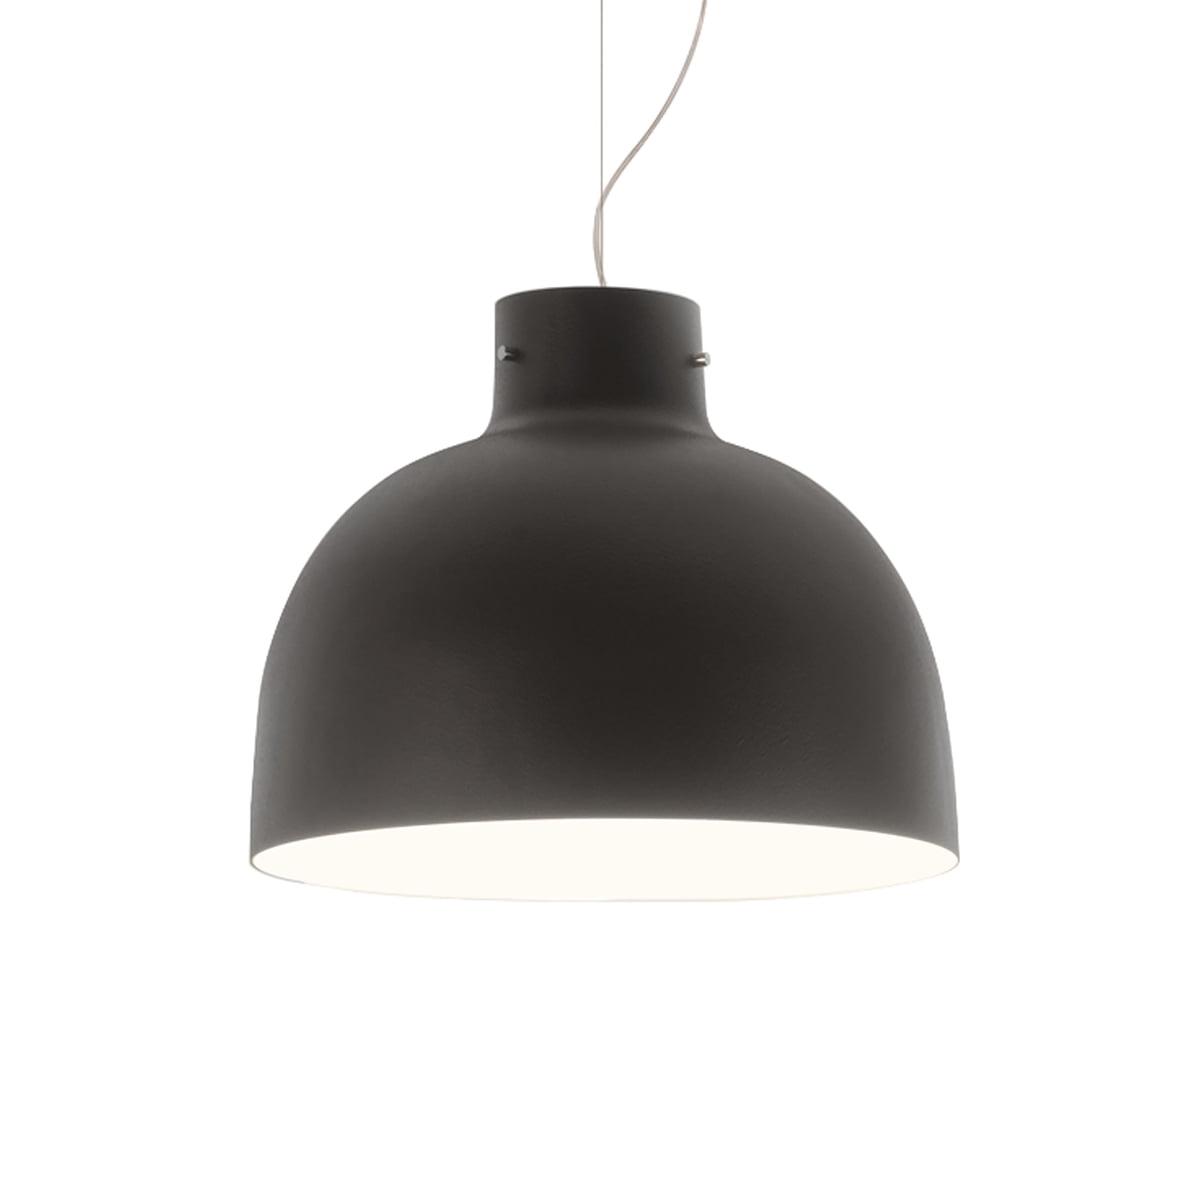 Suspensie Kartell Bellissima design Ferruccio Laviani LED 15W d50cm negru poza